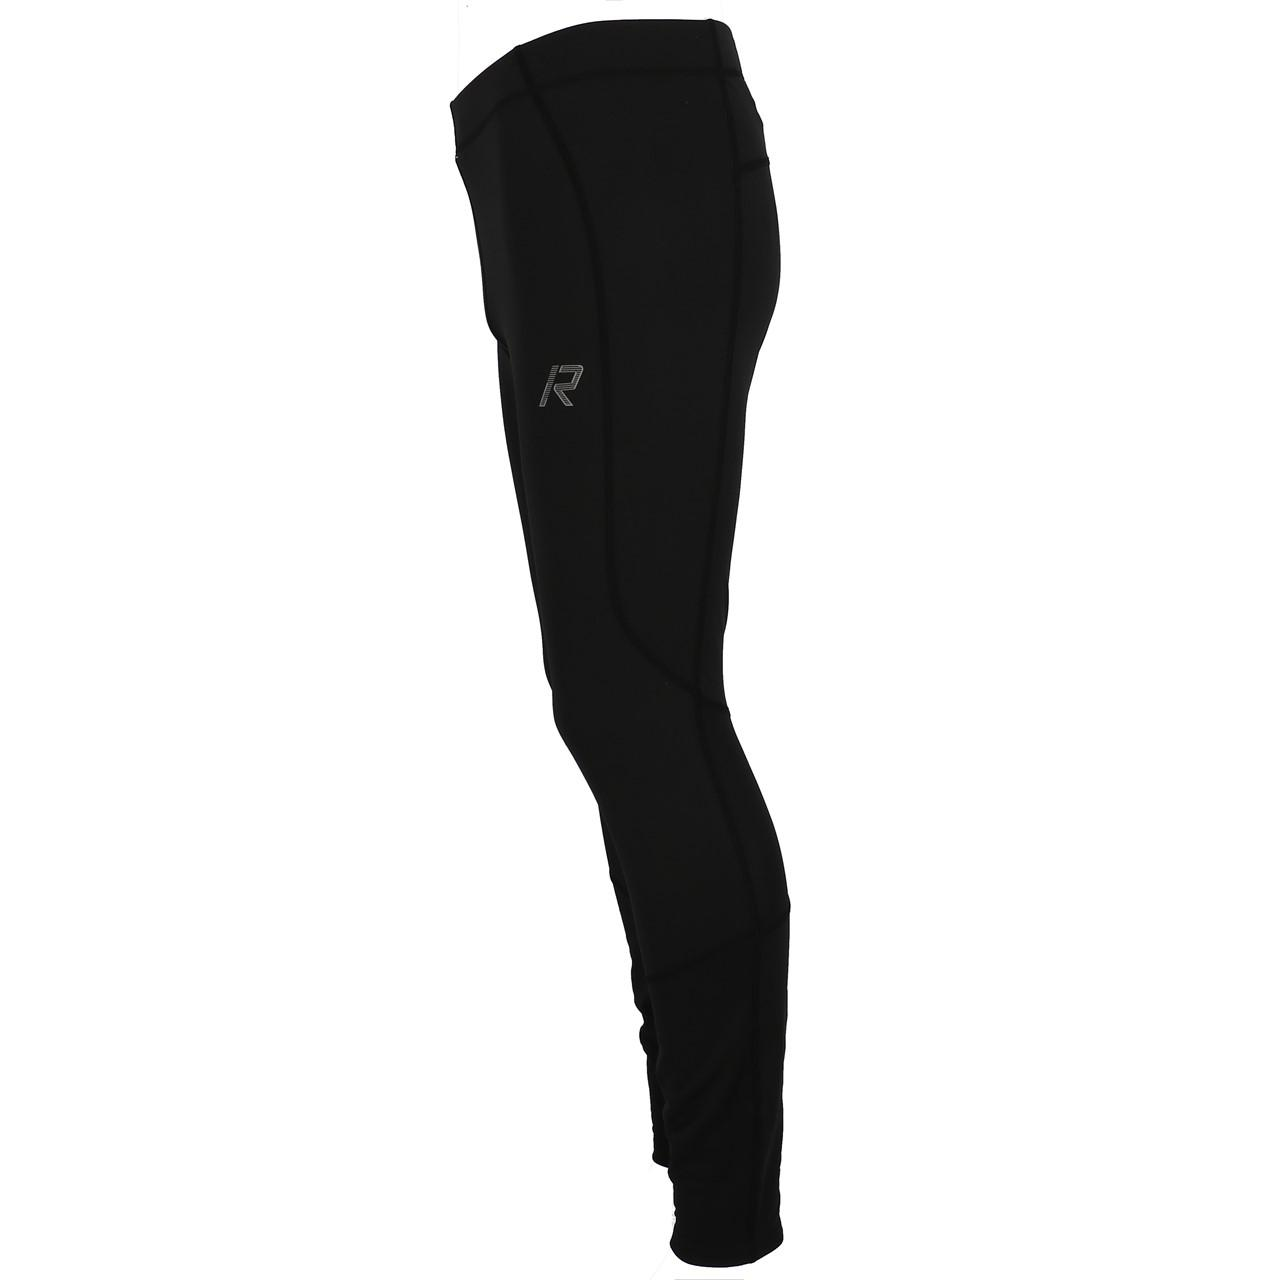 Legging-Sport-Rukka-Jonah-Blk-Tight-Run-Schwarz-25715-Neu Indexbild 2